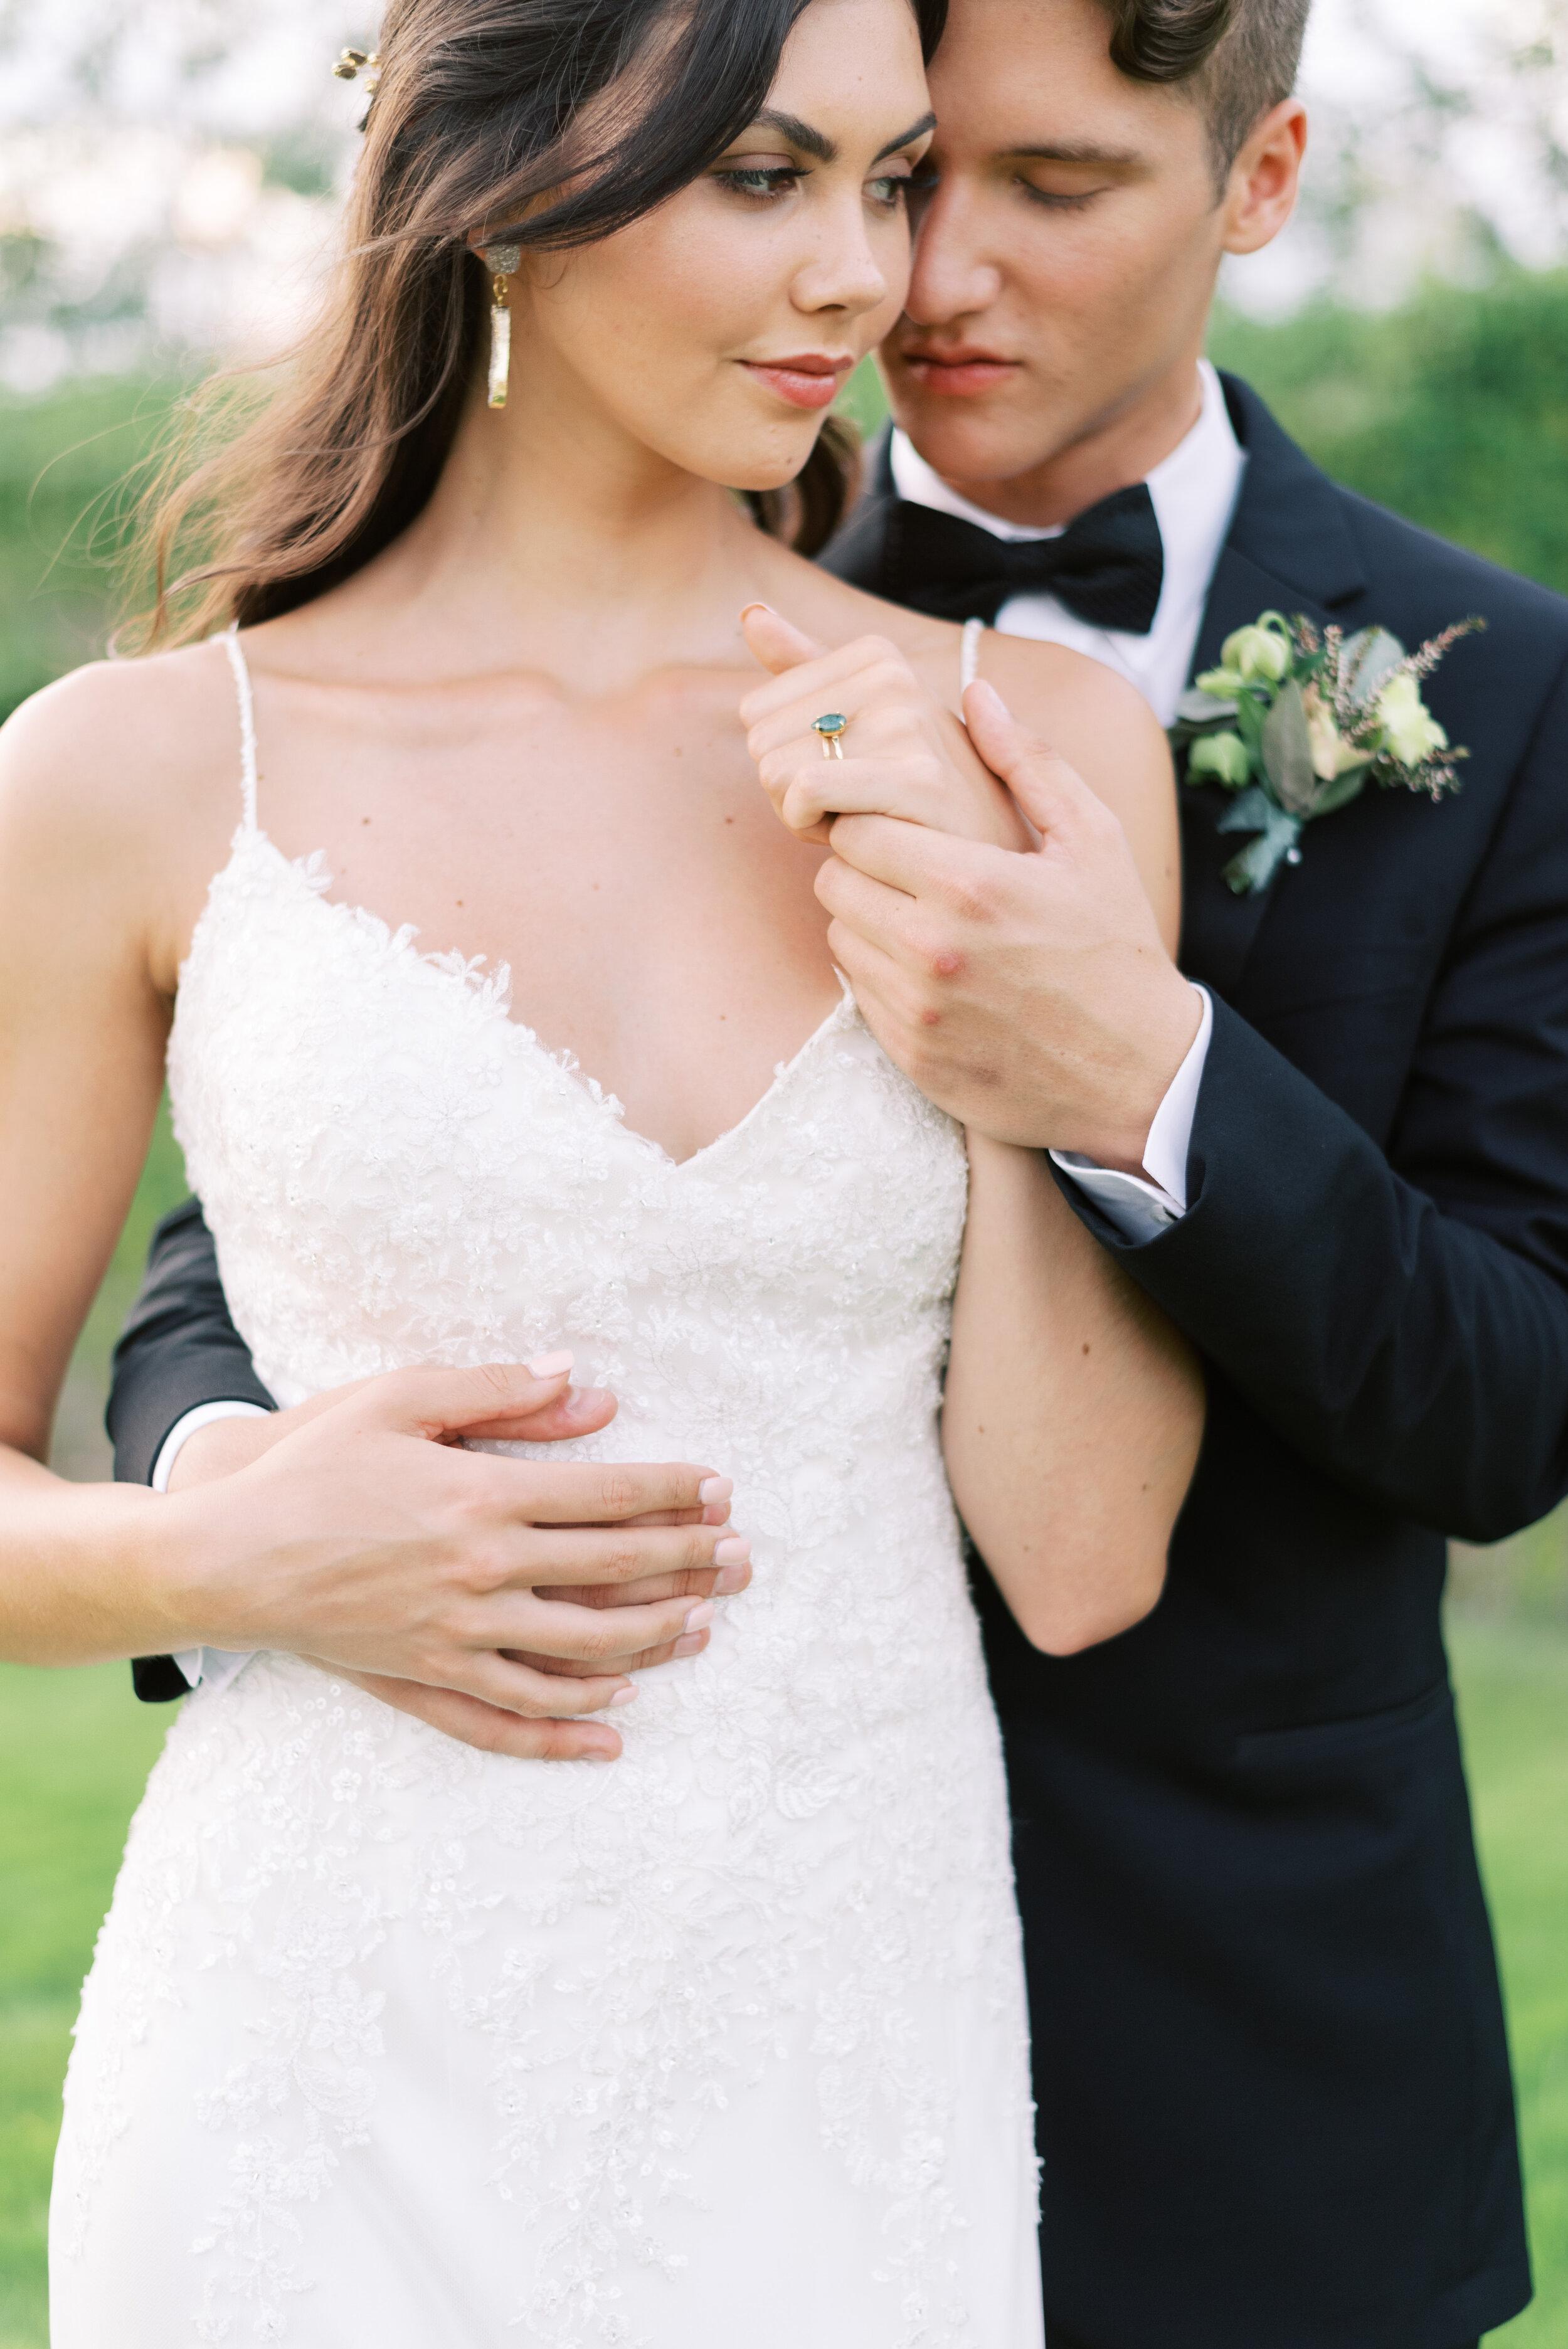 Bibb_Mill_Wedding_Editorial_Columbus_Georgia_Fallen_Photography_6-79.JPG